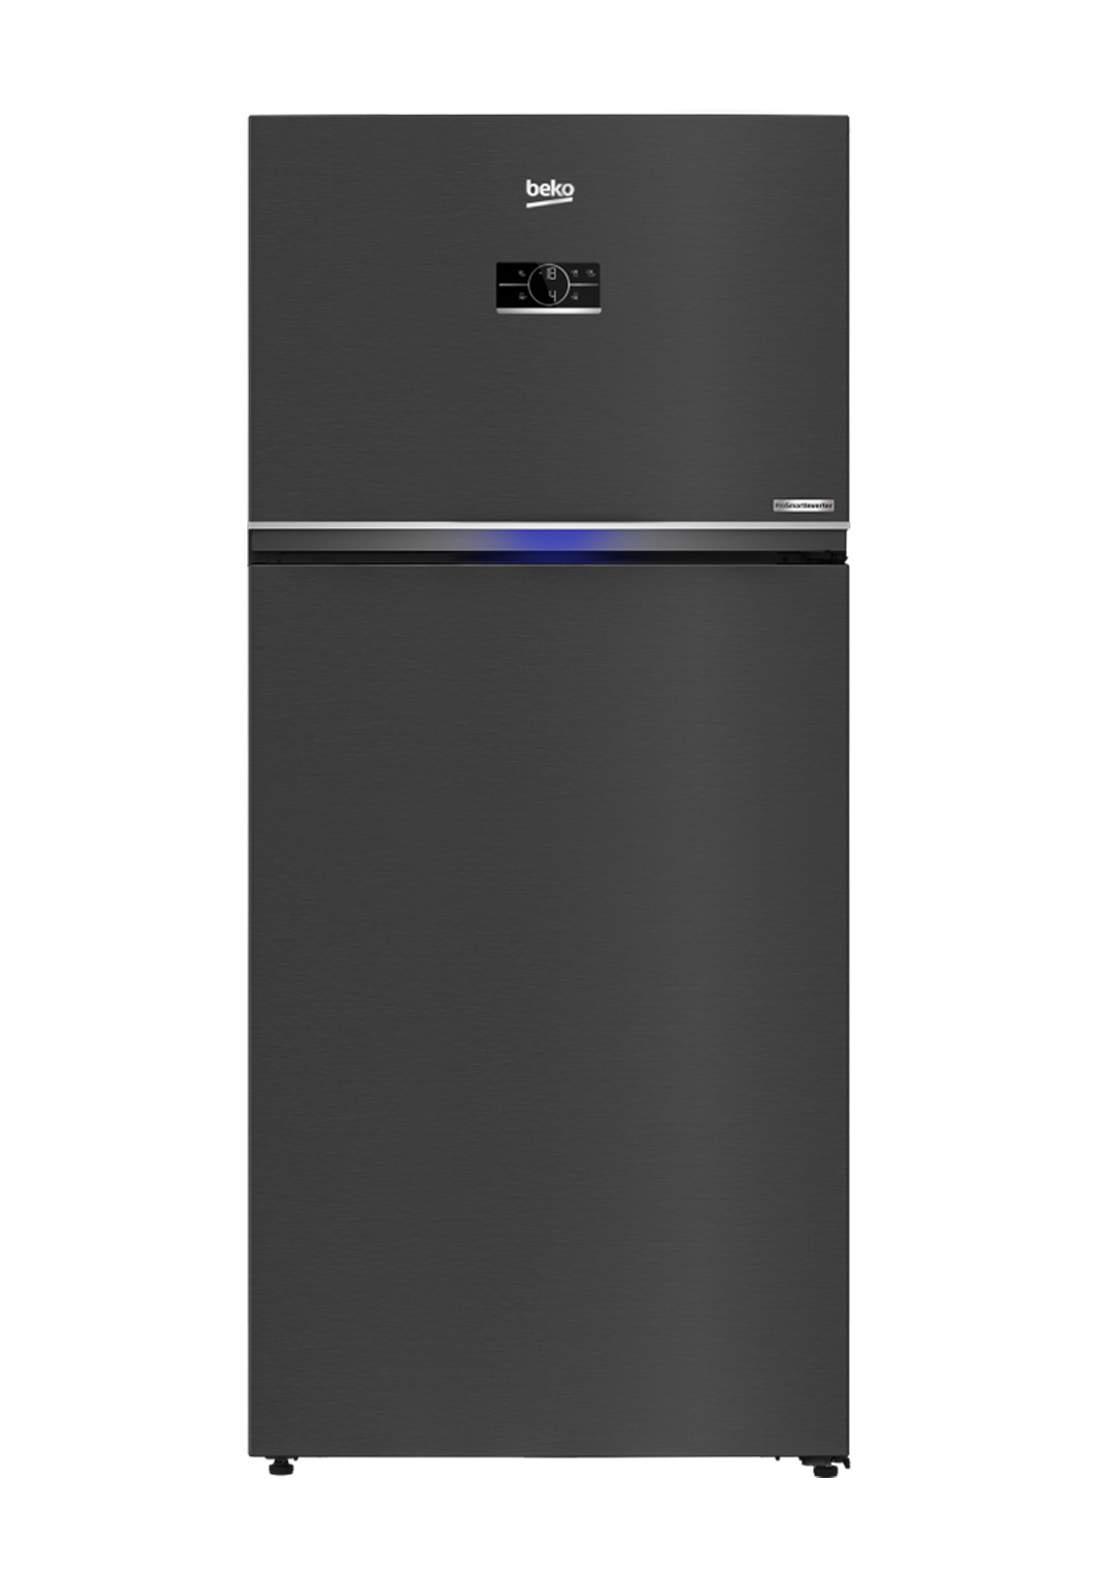 Beko RDNE 700E40 XBR Refrigerator 650 Liter - Black